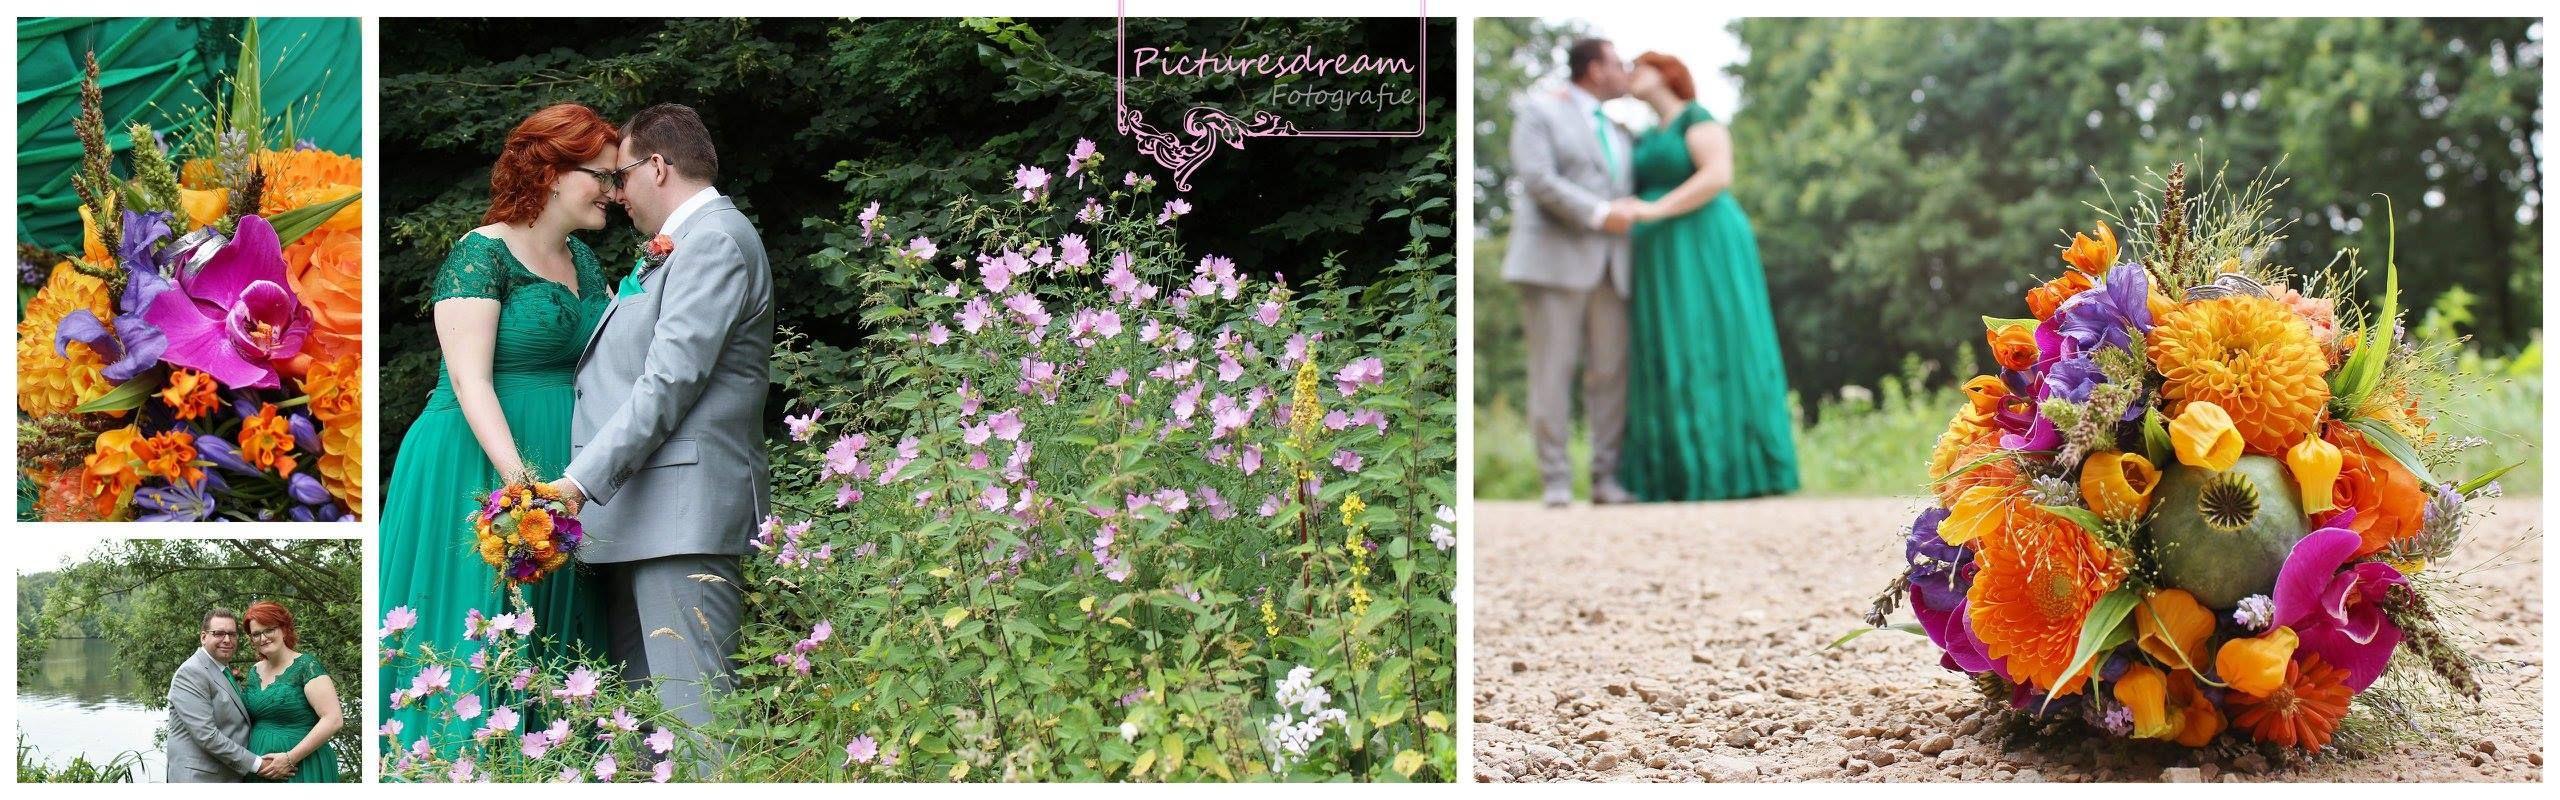 Bruiloft - Wedding